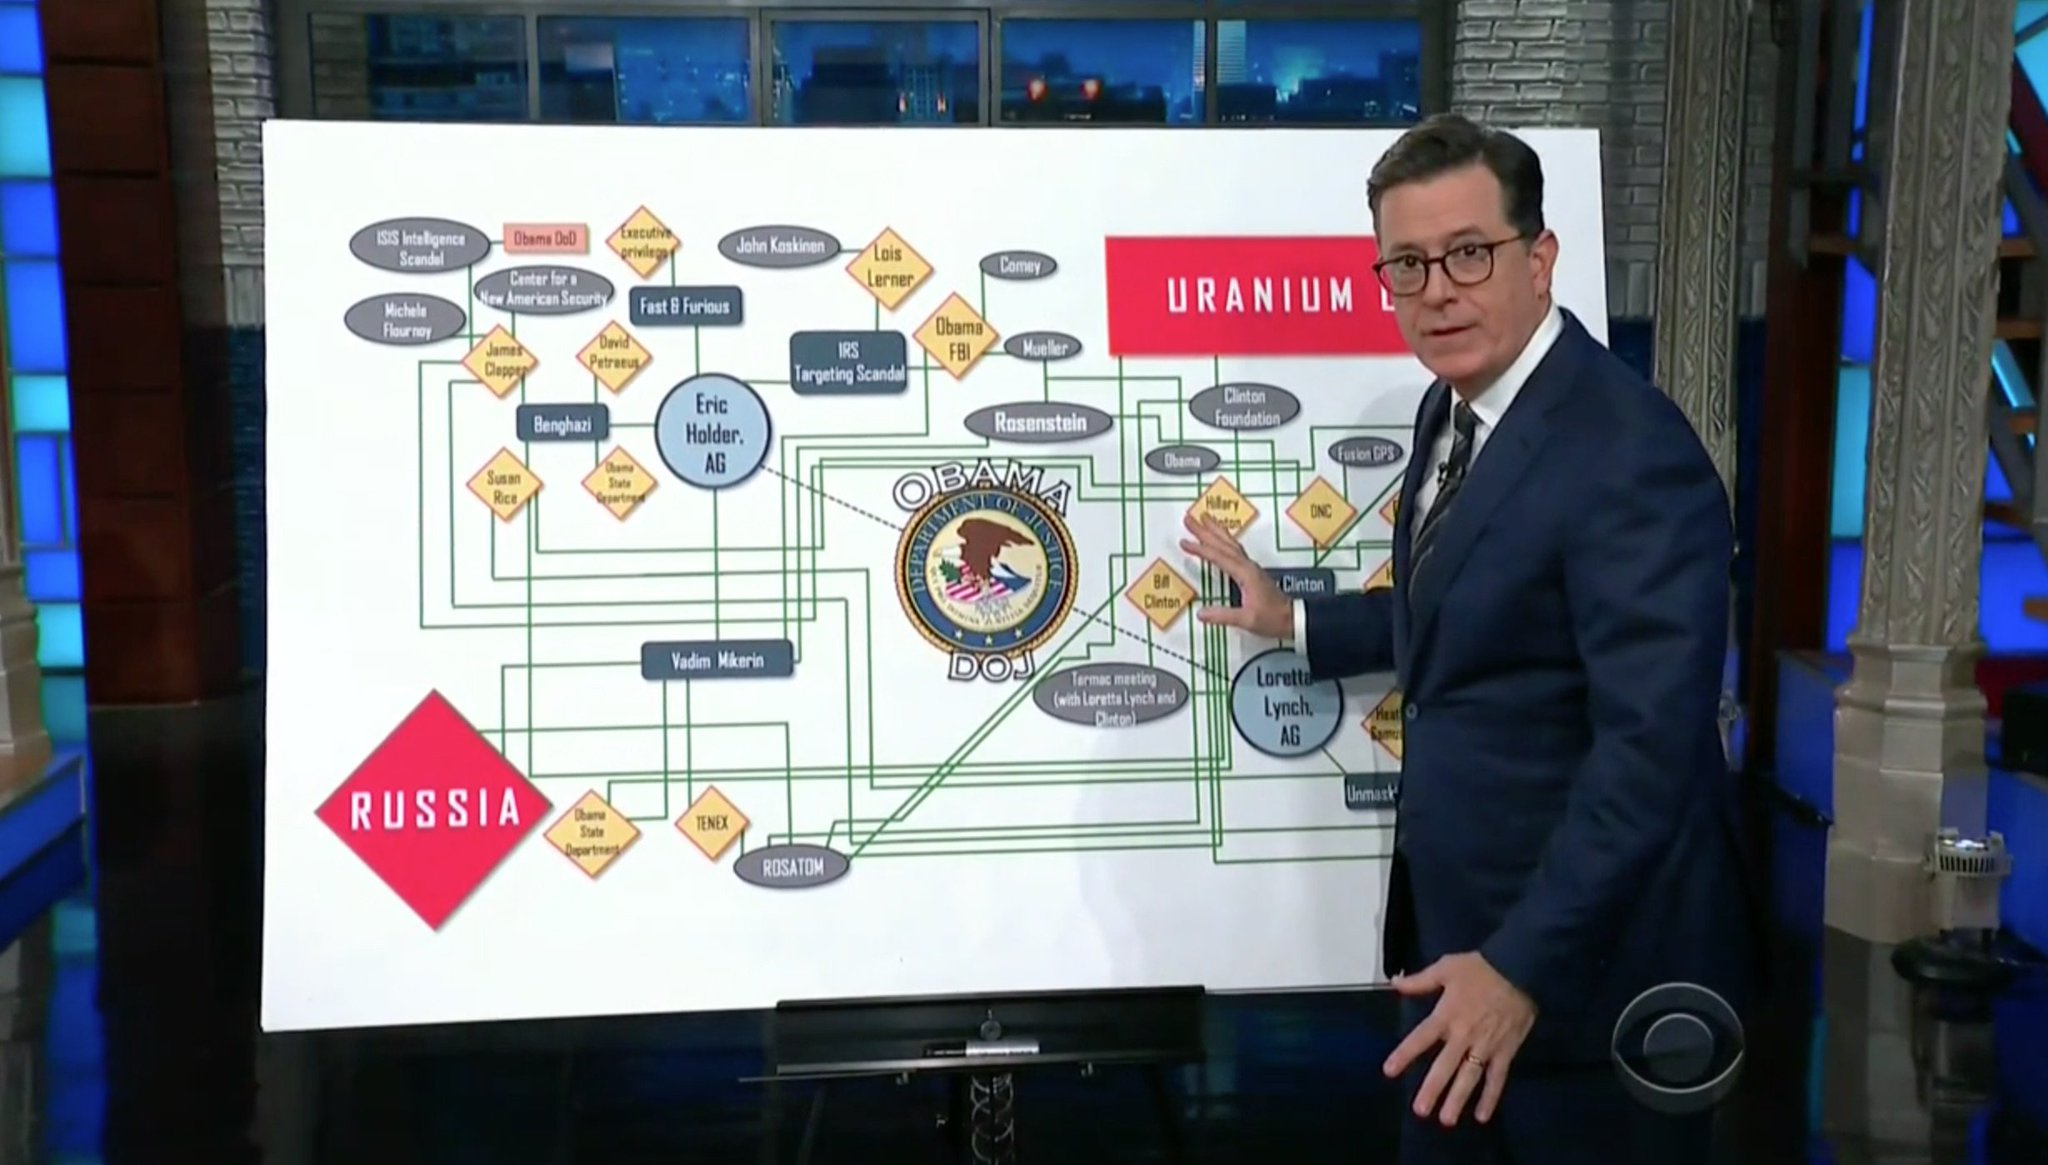 Stephen Colbert Mocks Louie Gohmert's Conspiracy Chart: 'Let's Play Candyland' https://t.co/nzqCsIQwg6 https://t.co/jwoWkh82VB